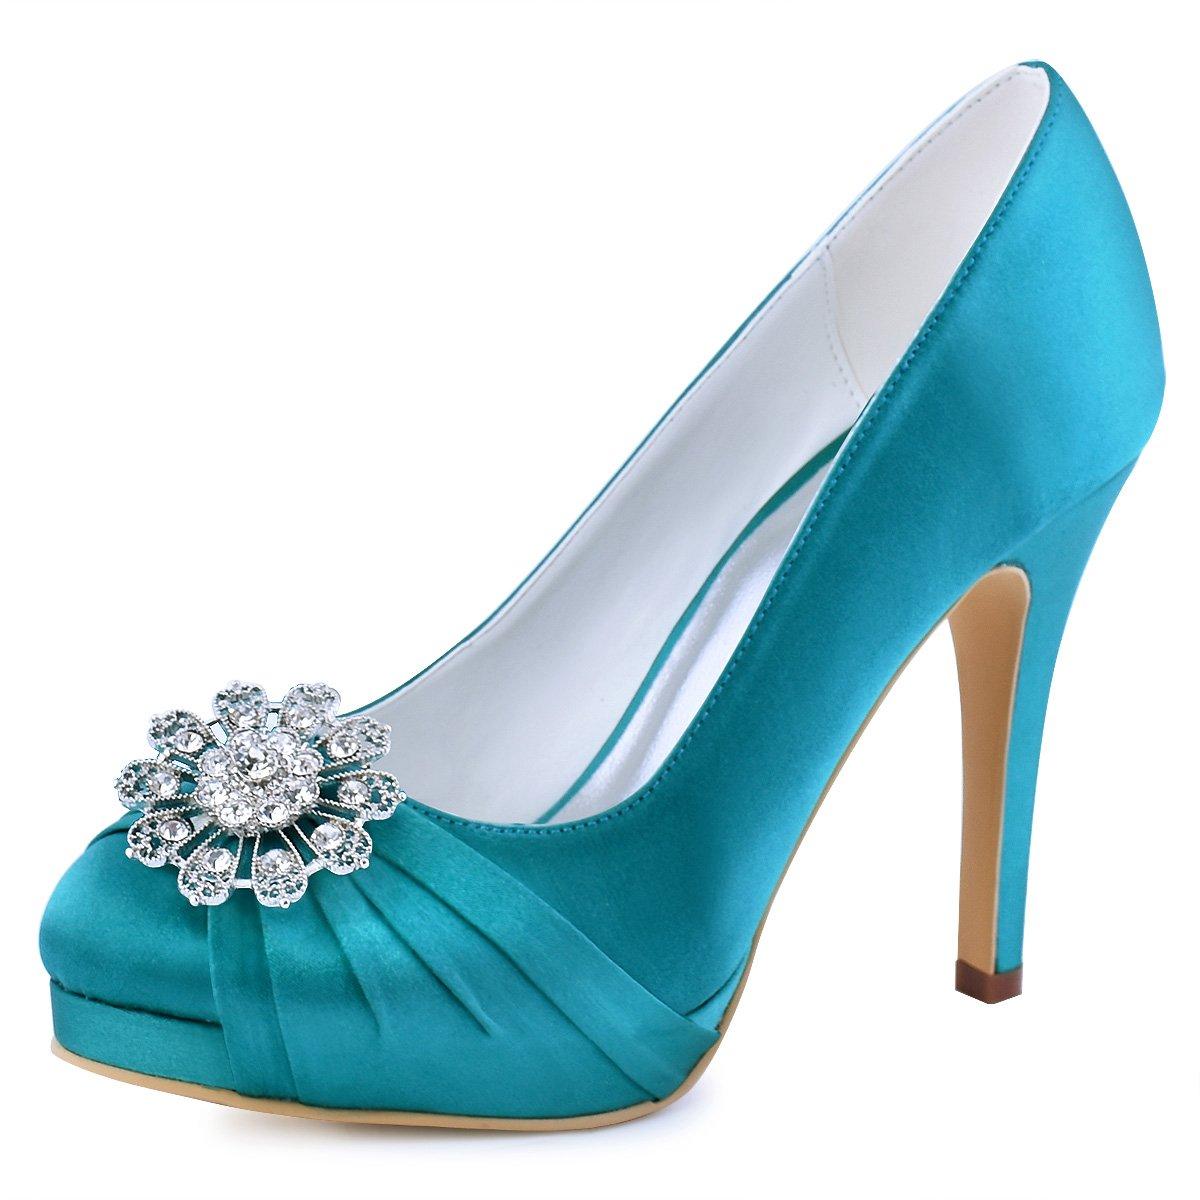 Elegantpark EP2015-PF Mujeres Bombas Punta Cerrada Zapatos Plataforma Zapatos Tacón Alto Rhinestones Satén Wedding Party Zapatos Novia 42 EU|Teal